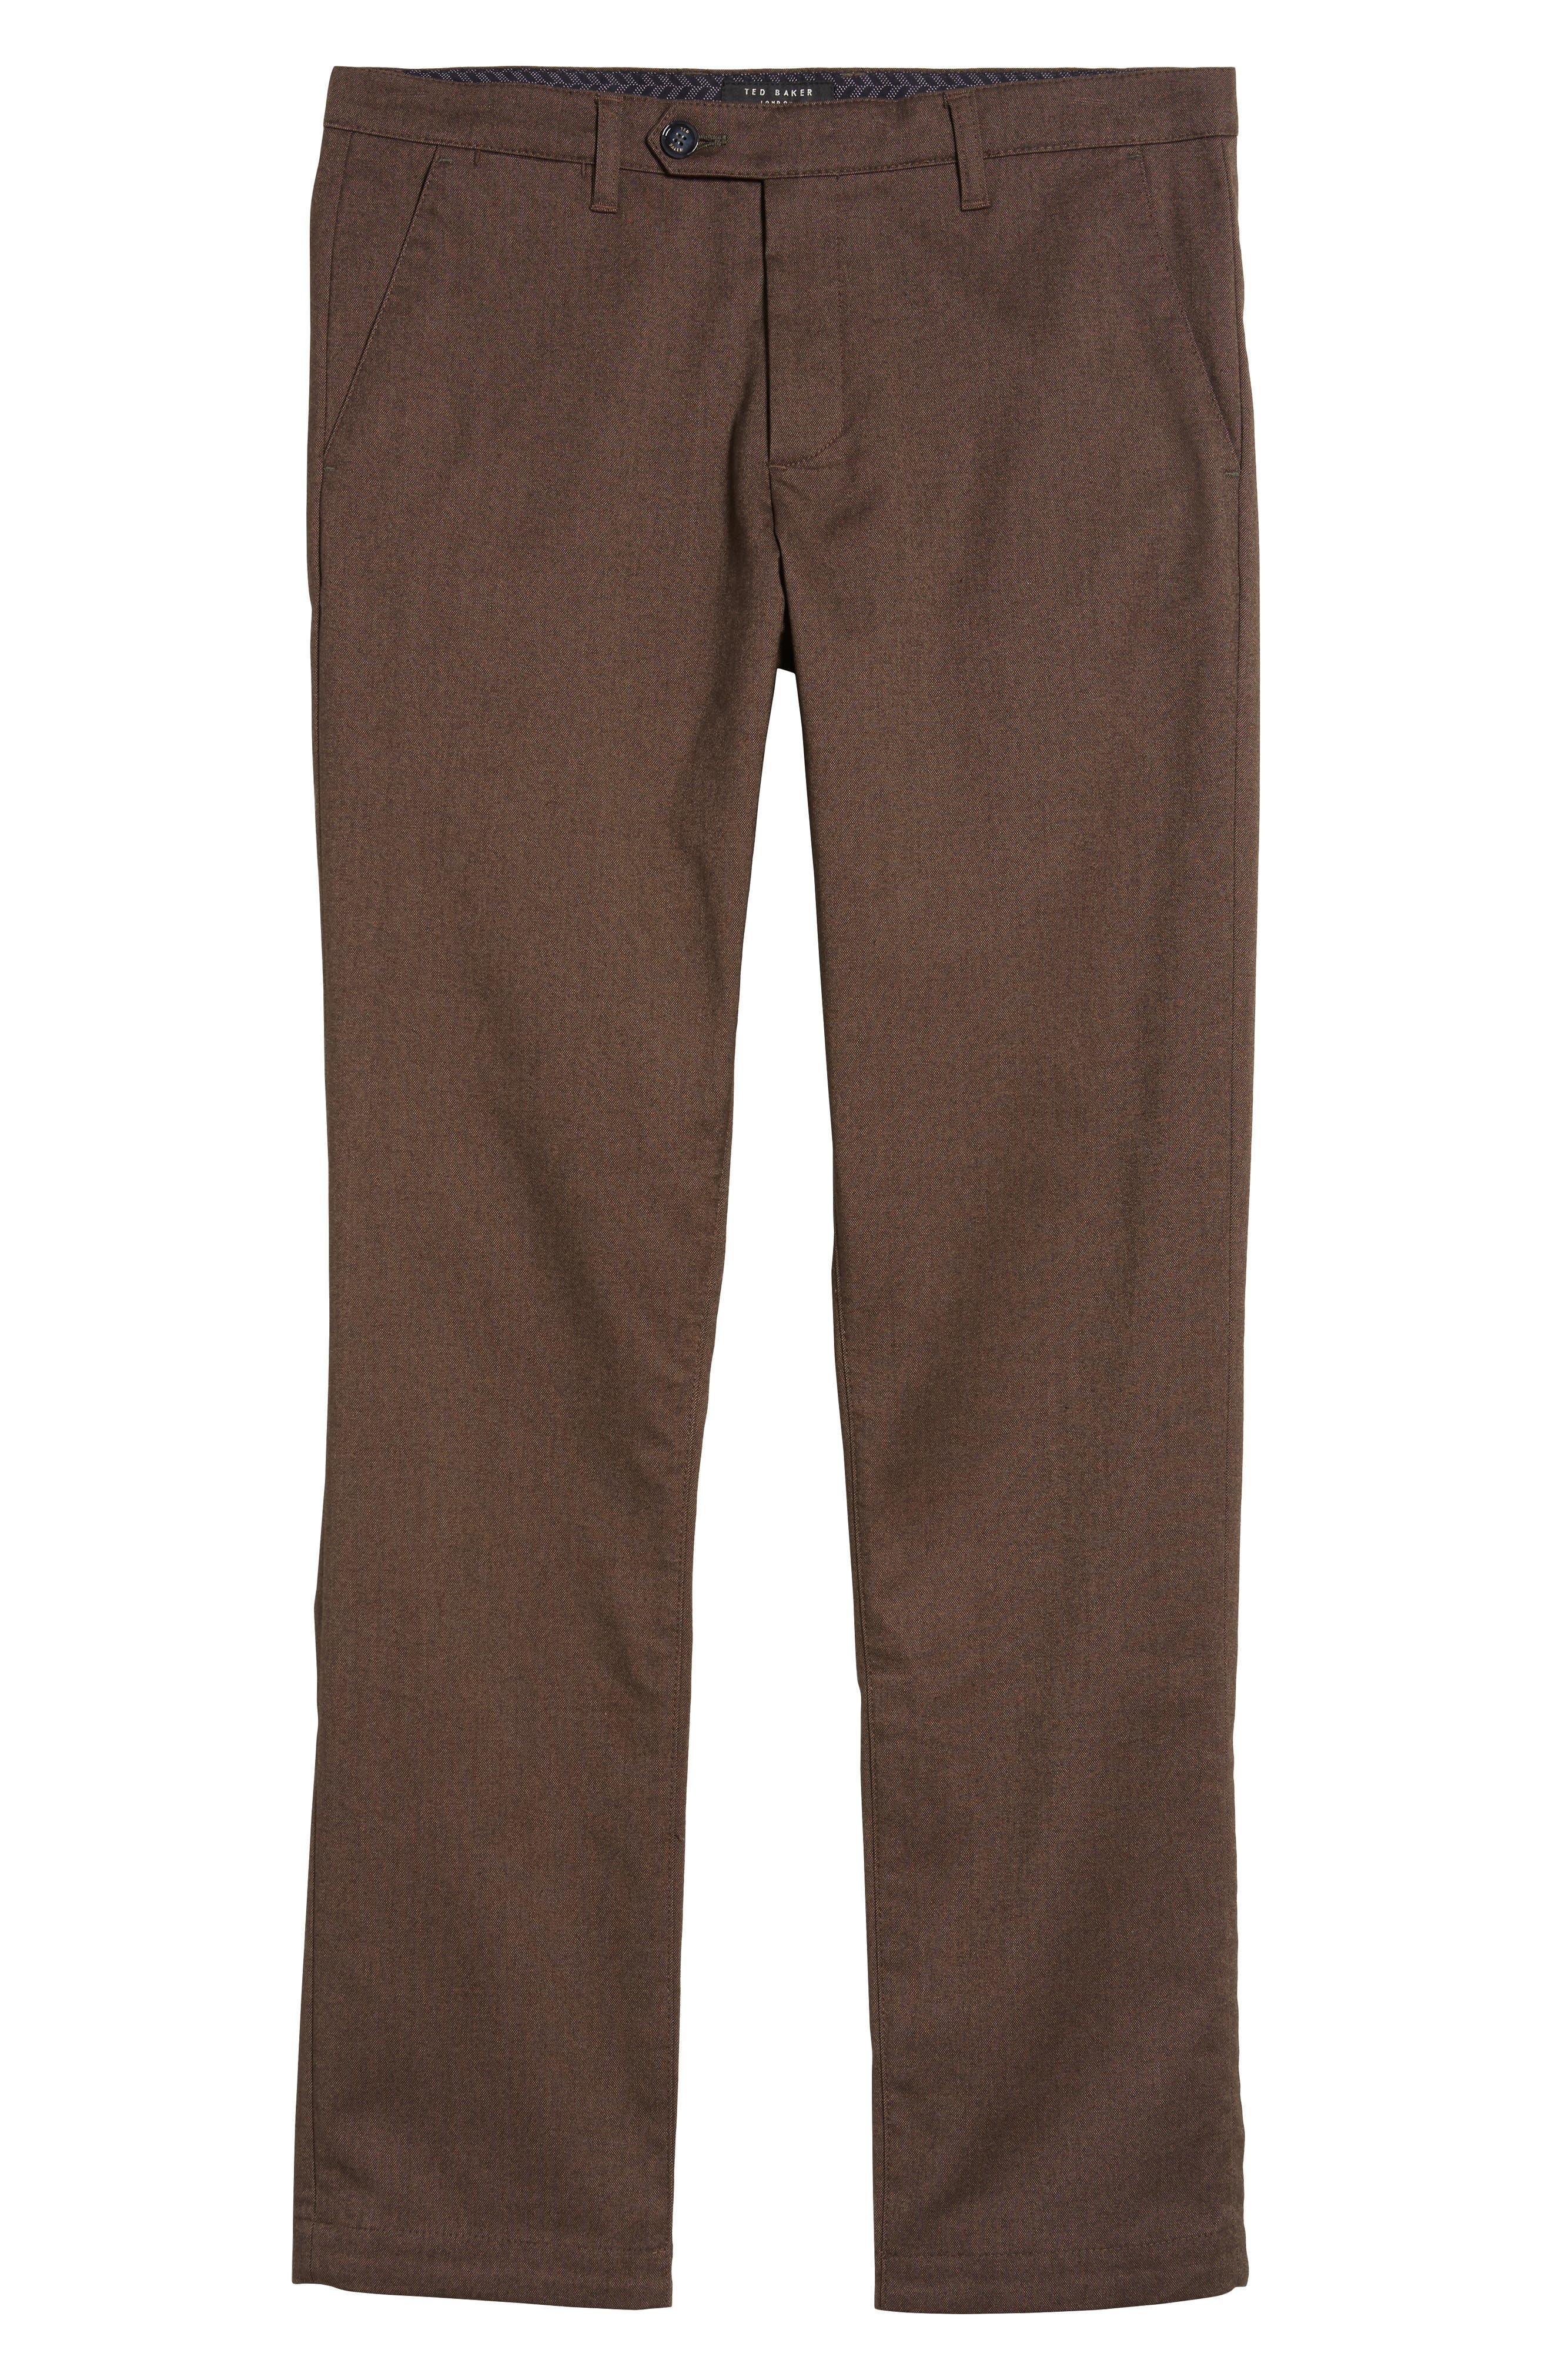 Freshman Modern Fit Brushed Pants,                             Alternate thumbnail 6, color,                             214